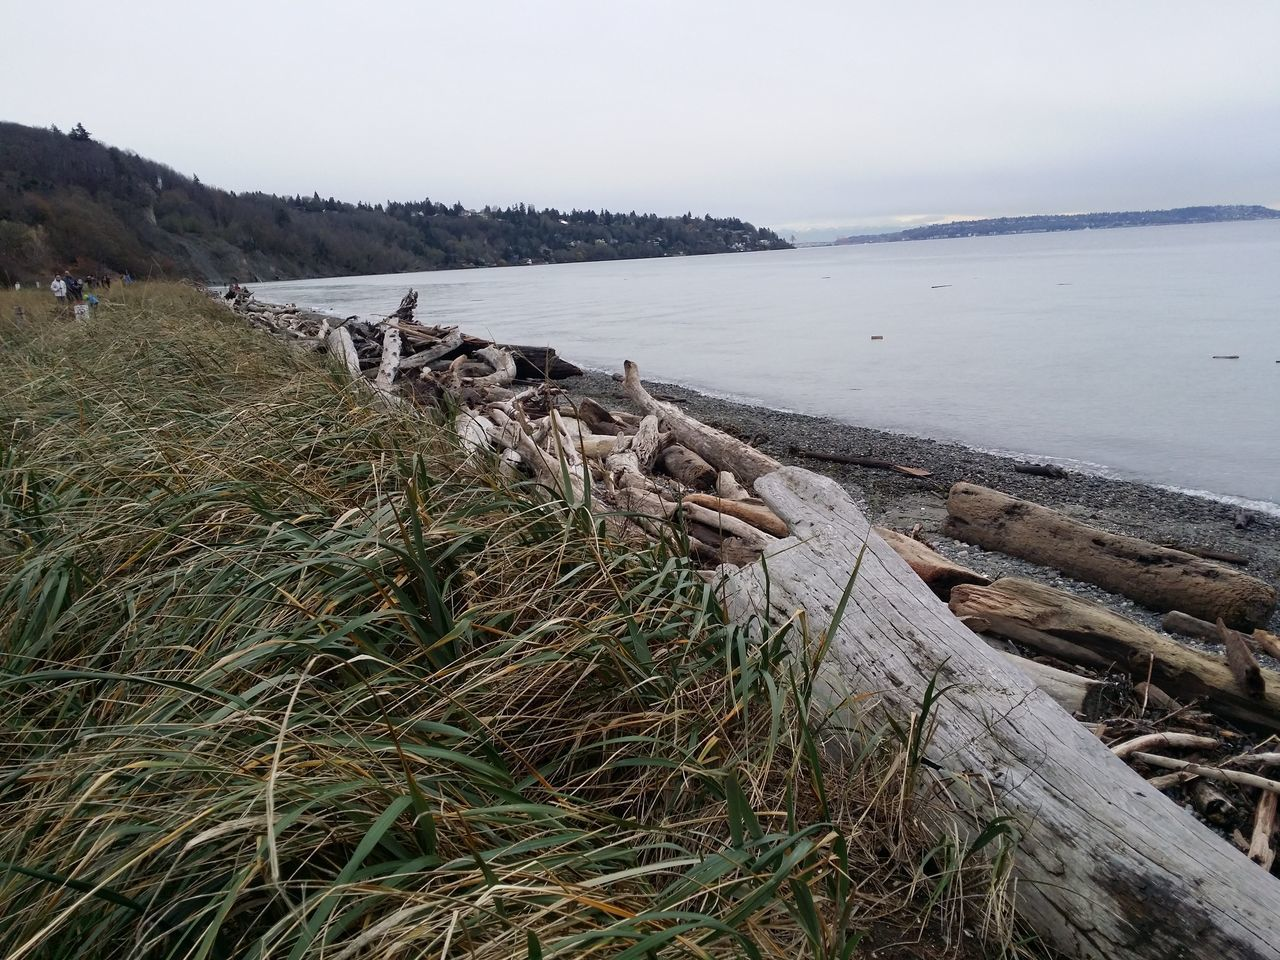 Oceanside Ocean Beach Baywalk By The Bay Drift Wood On Beach Bay